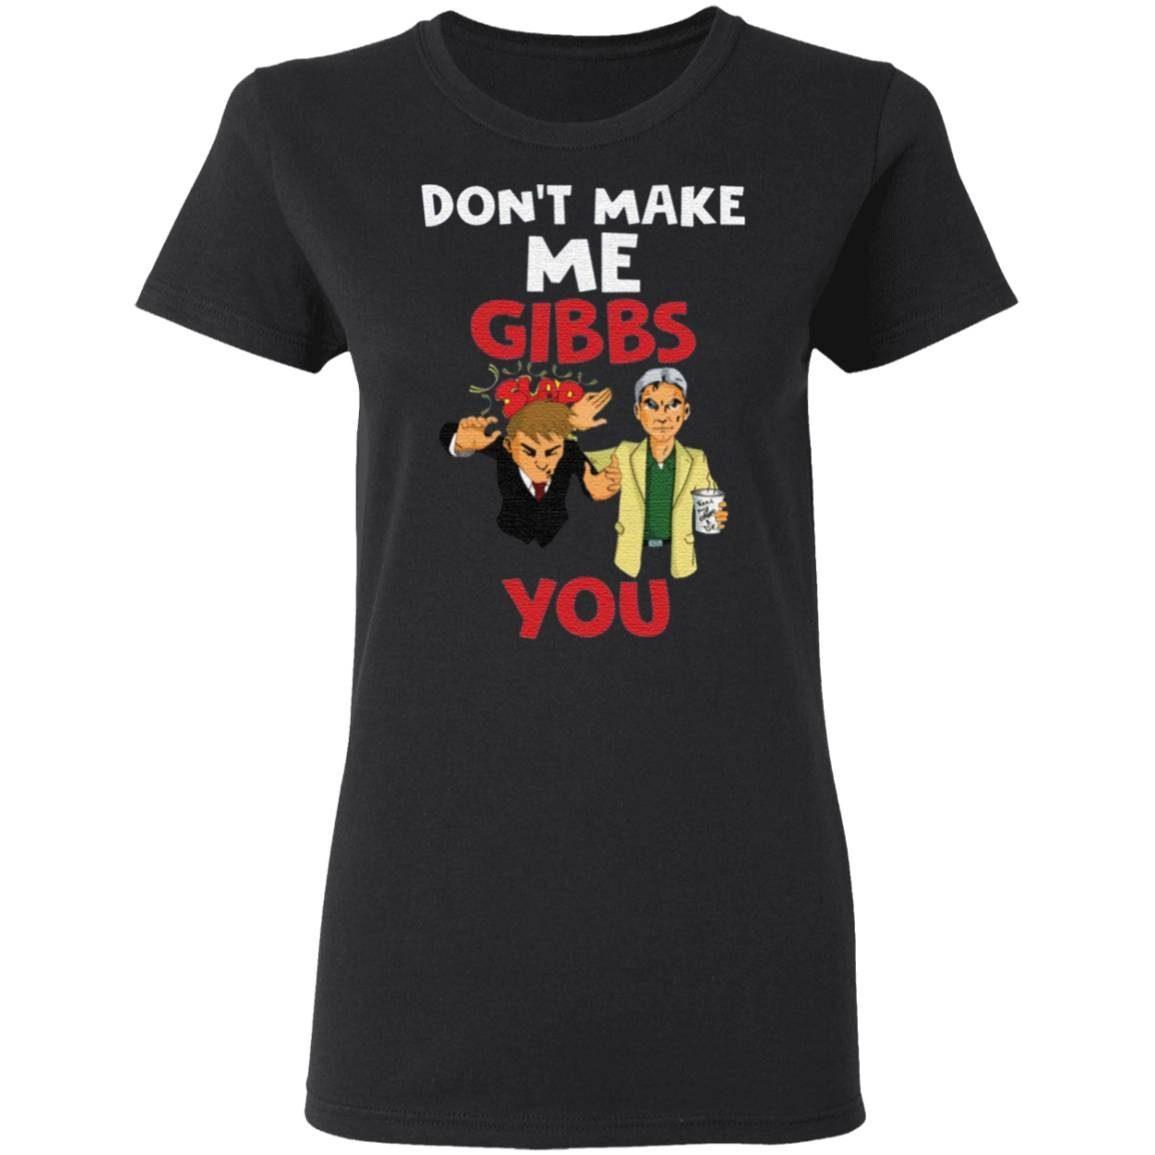 Don't Make Me Gibbs Slap You tshirt